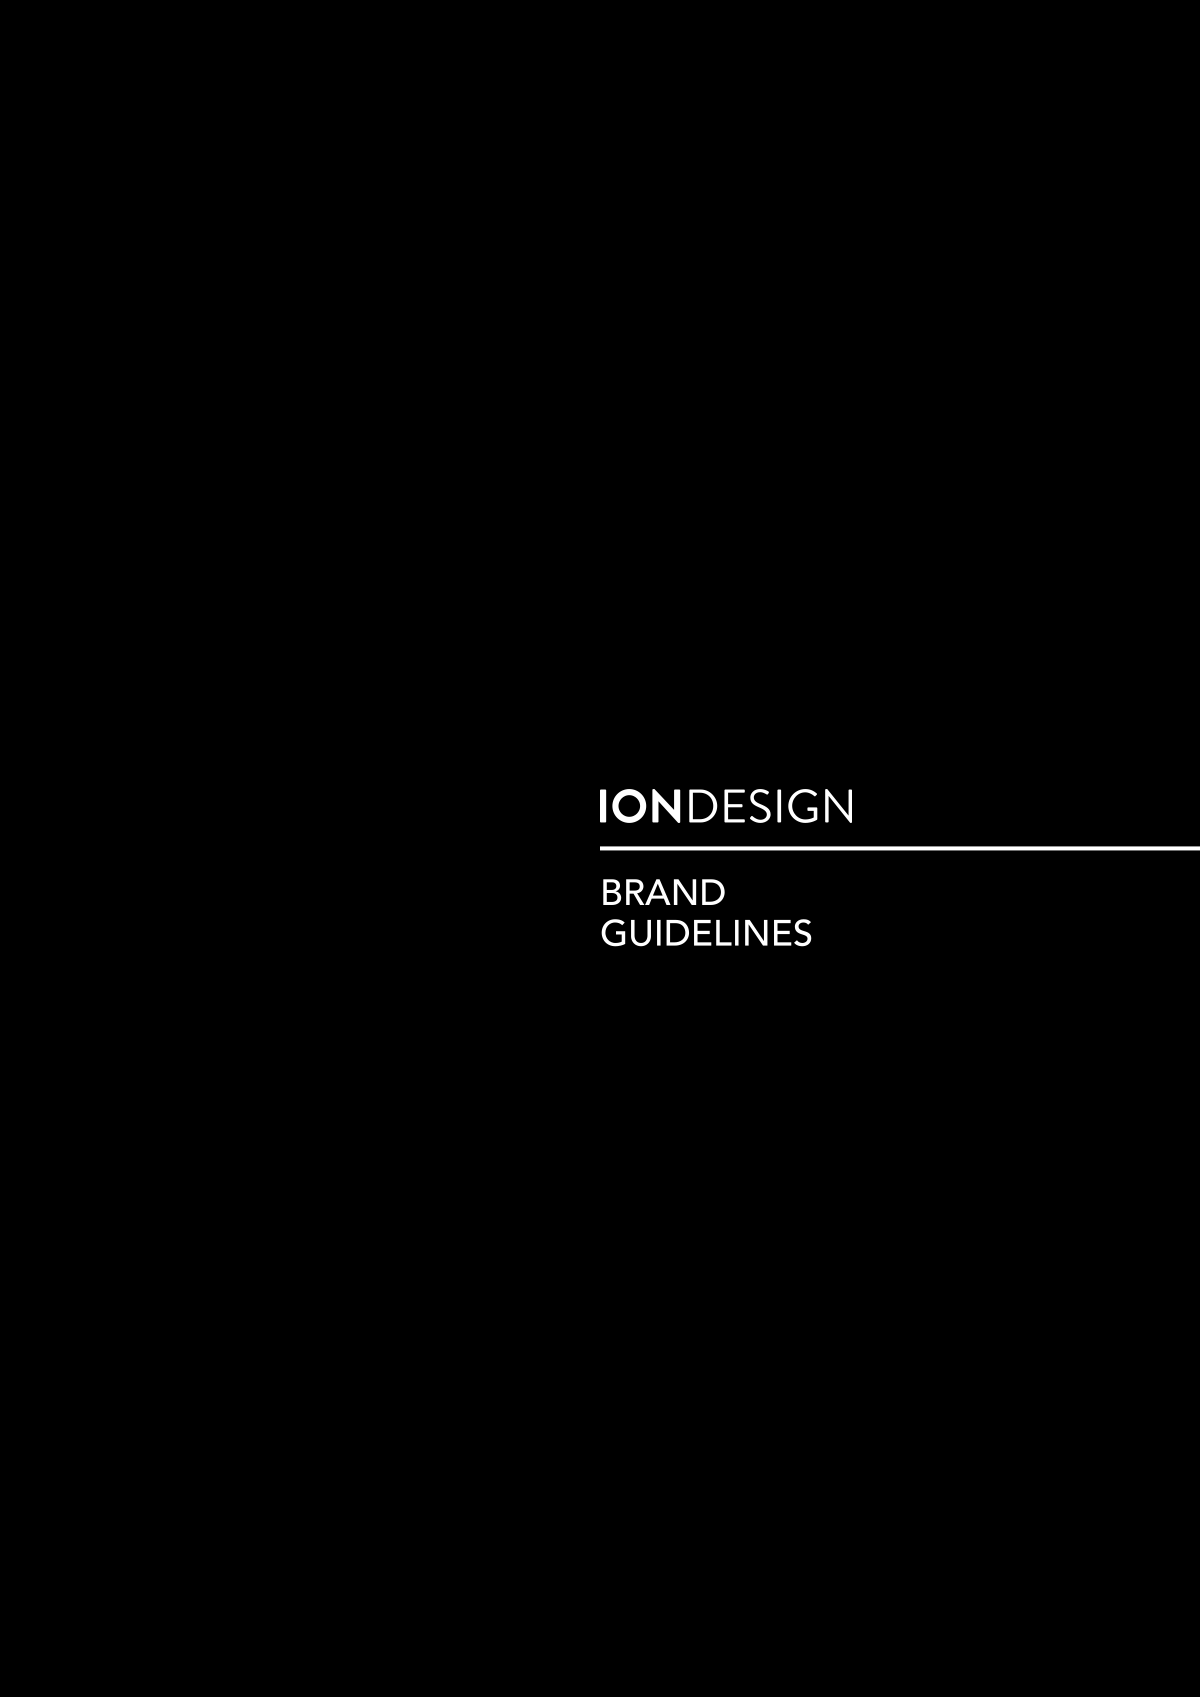 StyleGuide ION DESIGN